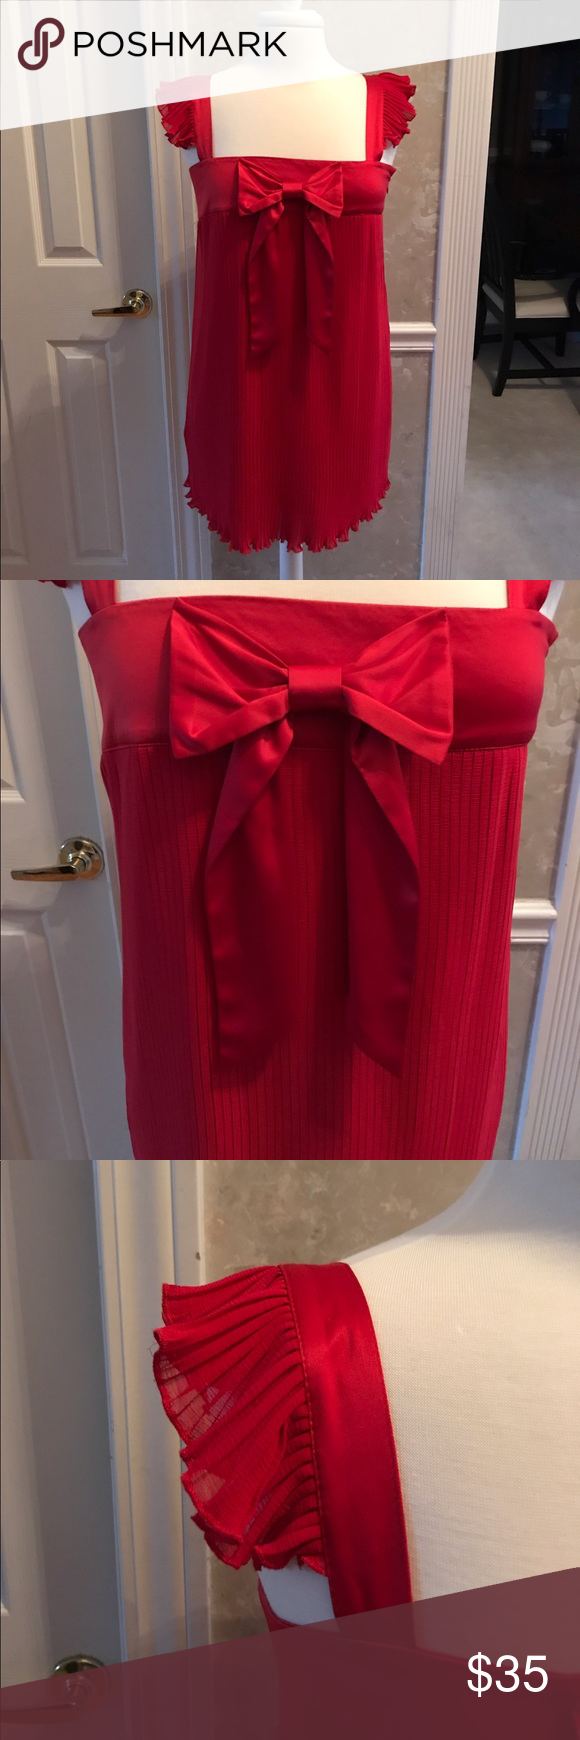 Red dress xoxo 100